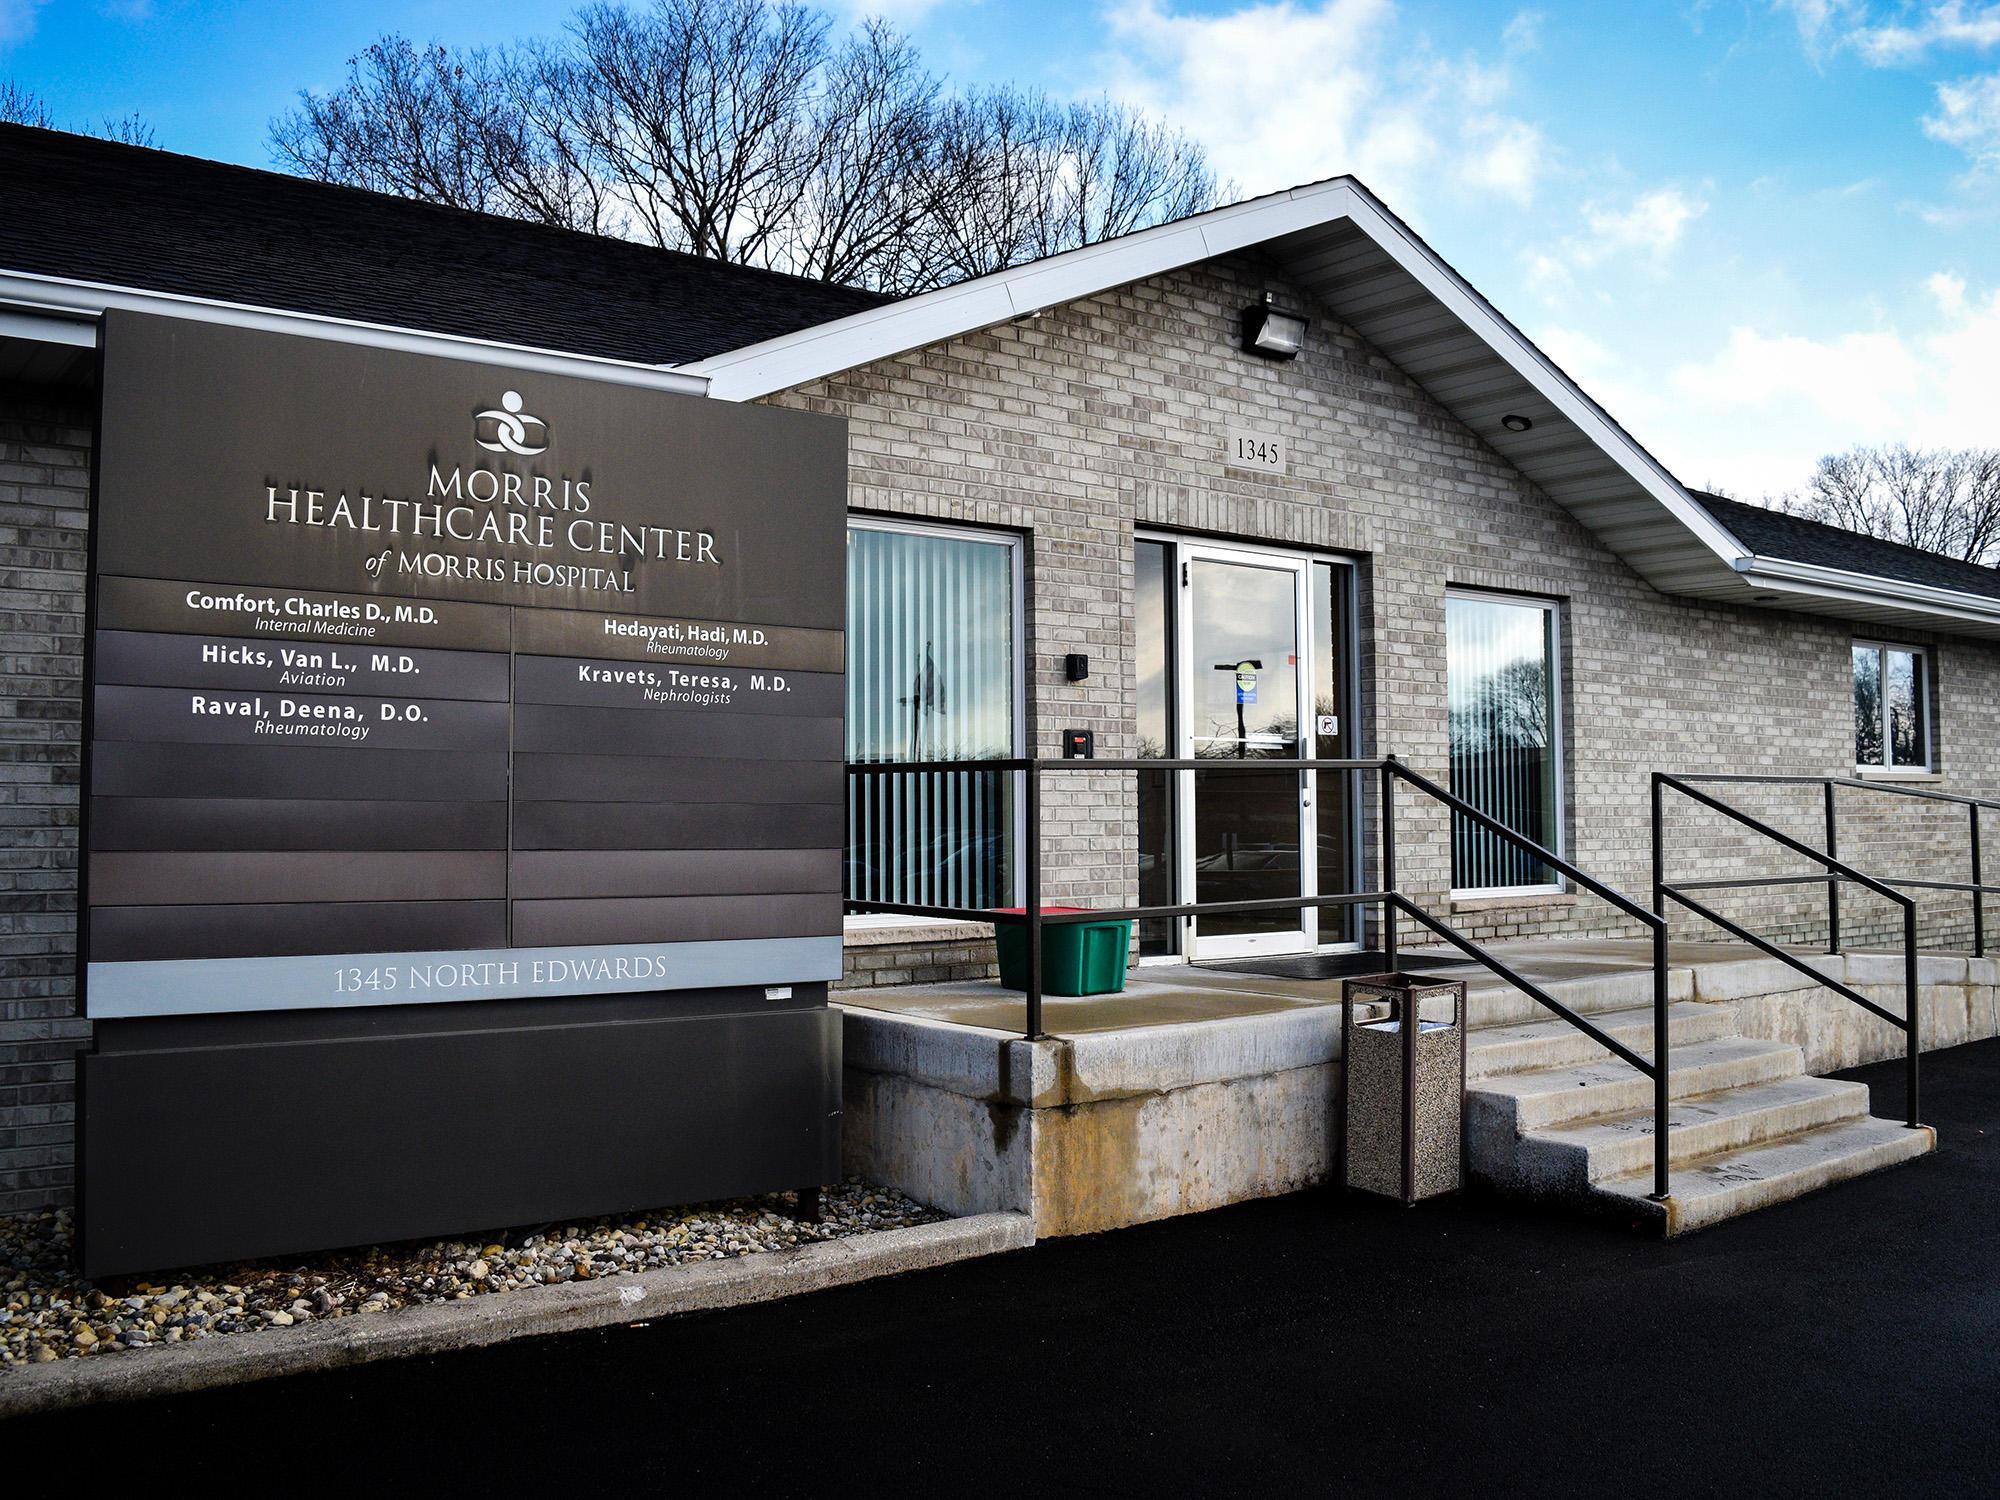 Morris Healthcare Center of Morris Hospital - Edwards Street